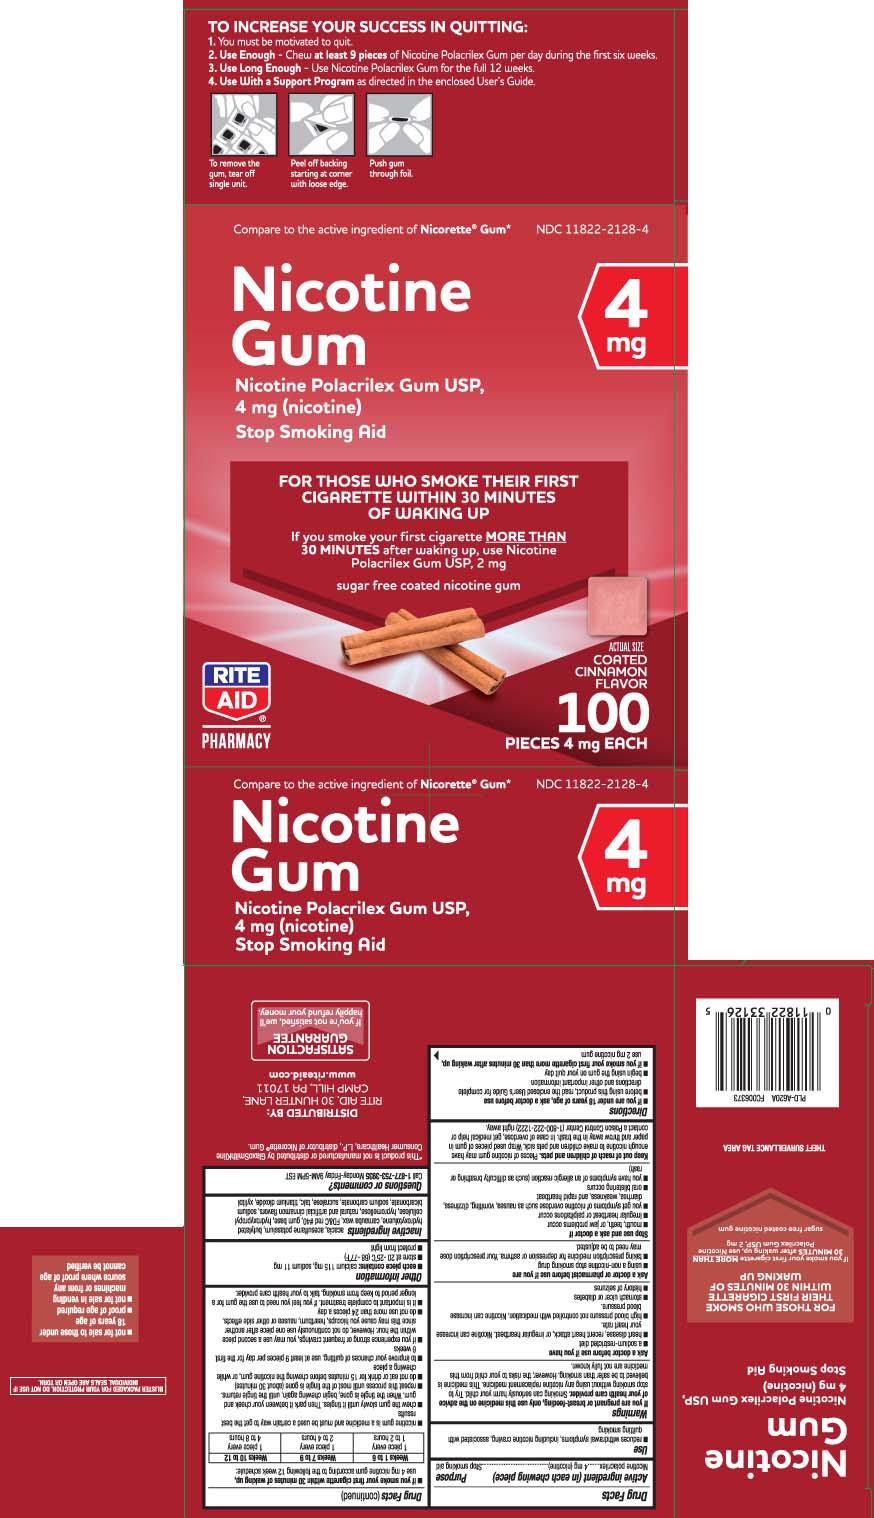 Nicotine polacrilex 4 mg (nicotine)